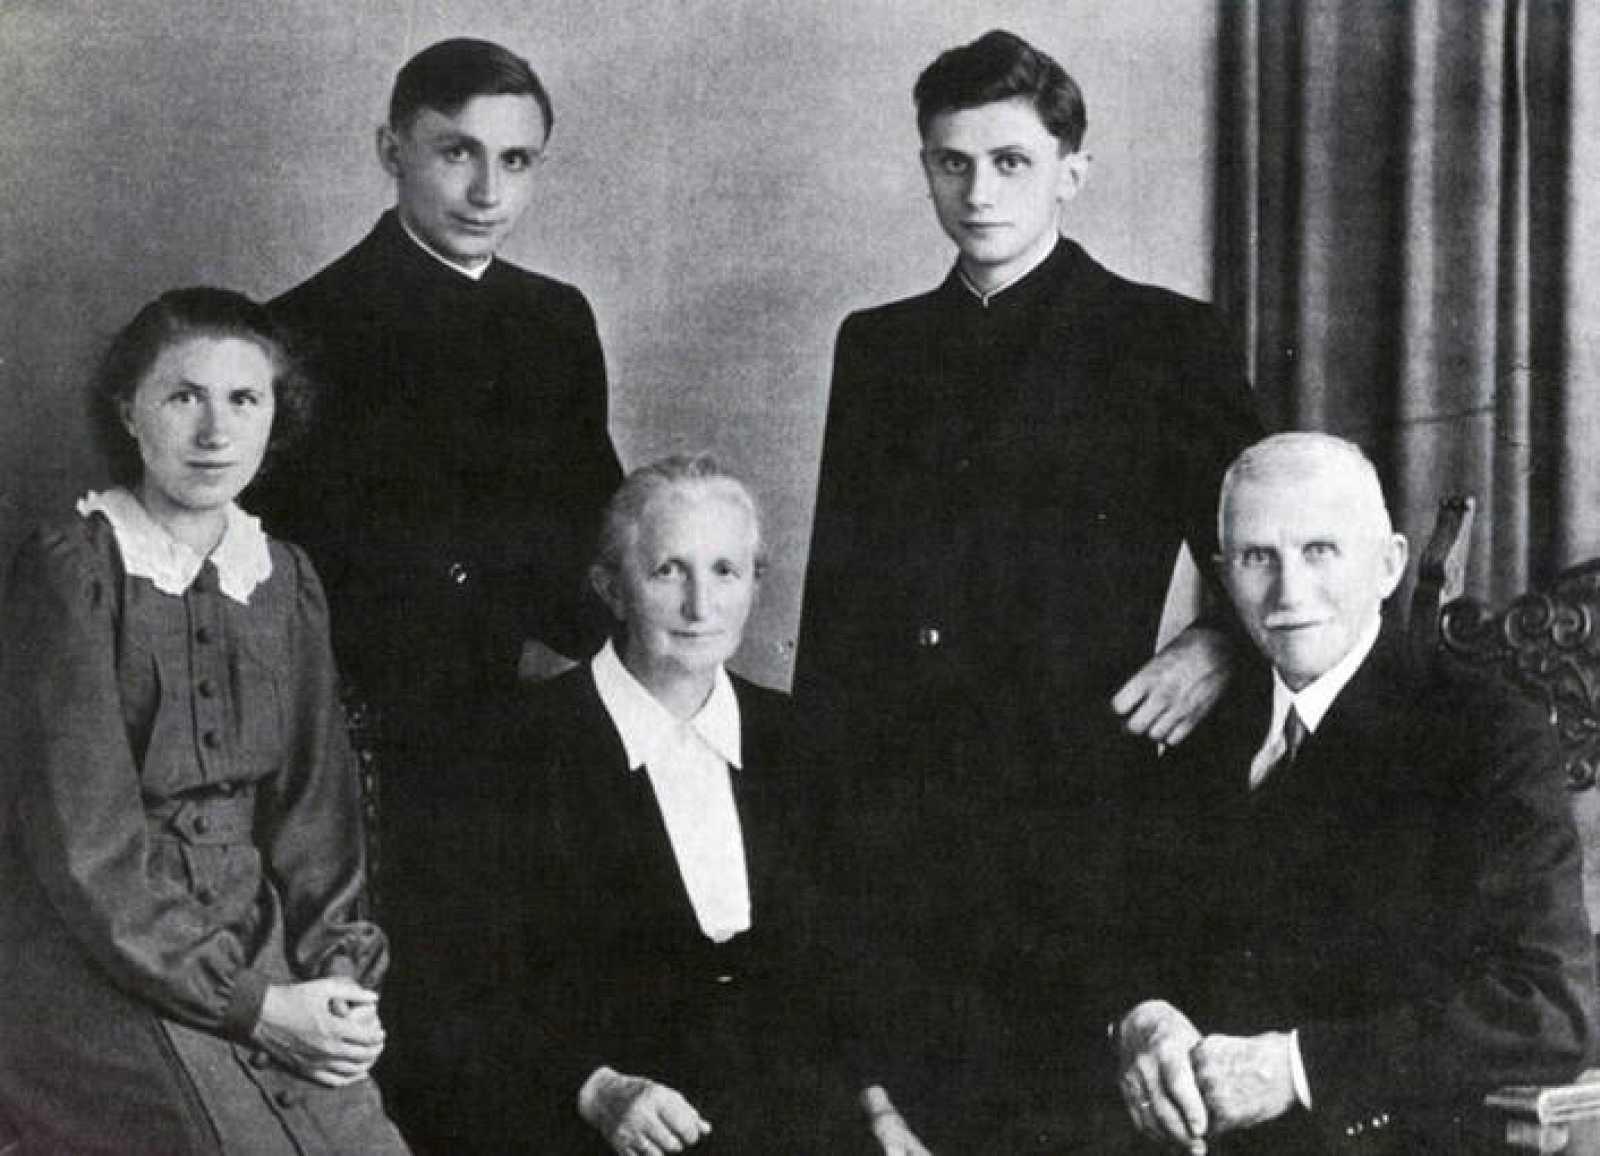 Fotografía tomada en 1951 de la familia Ratzinger